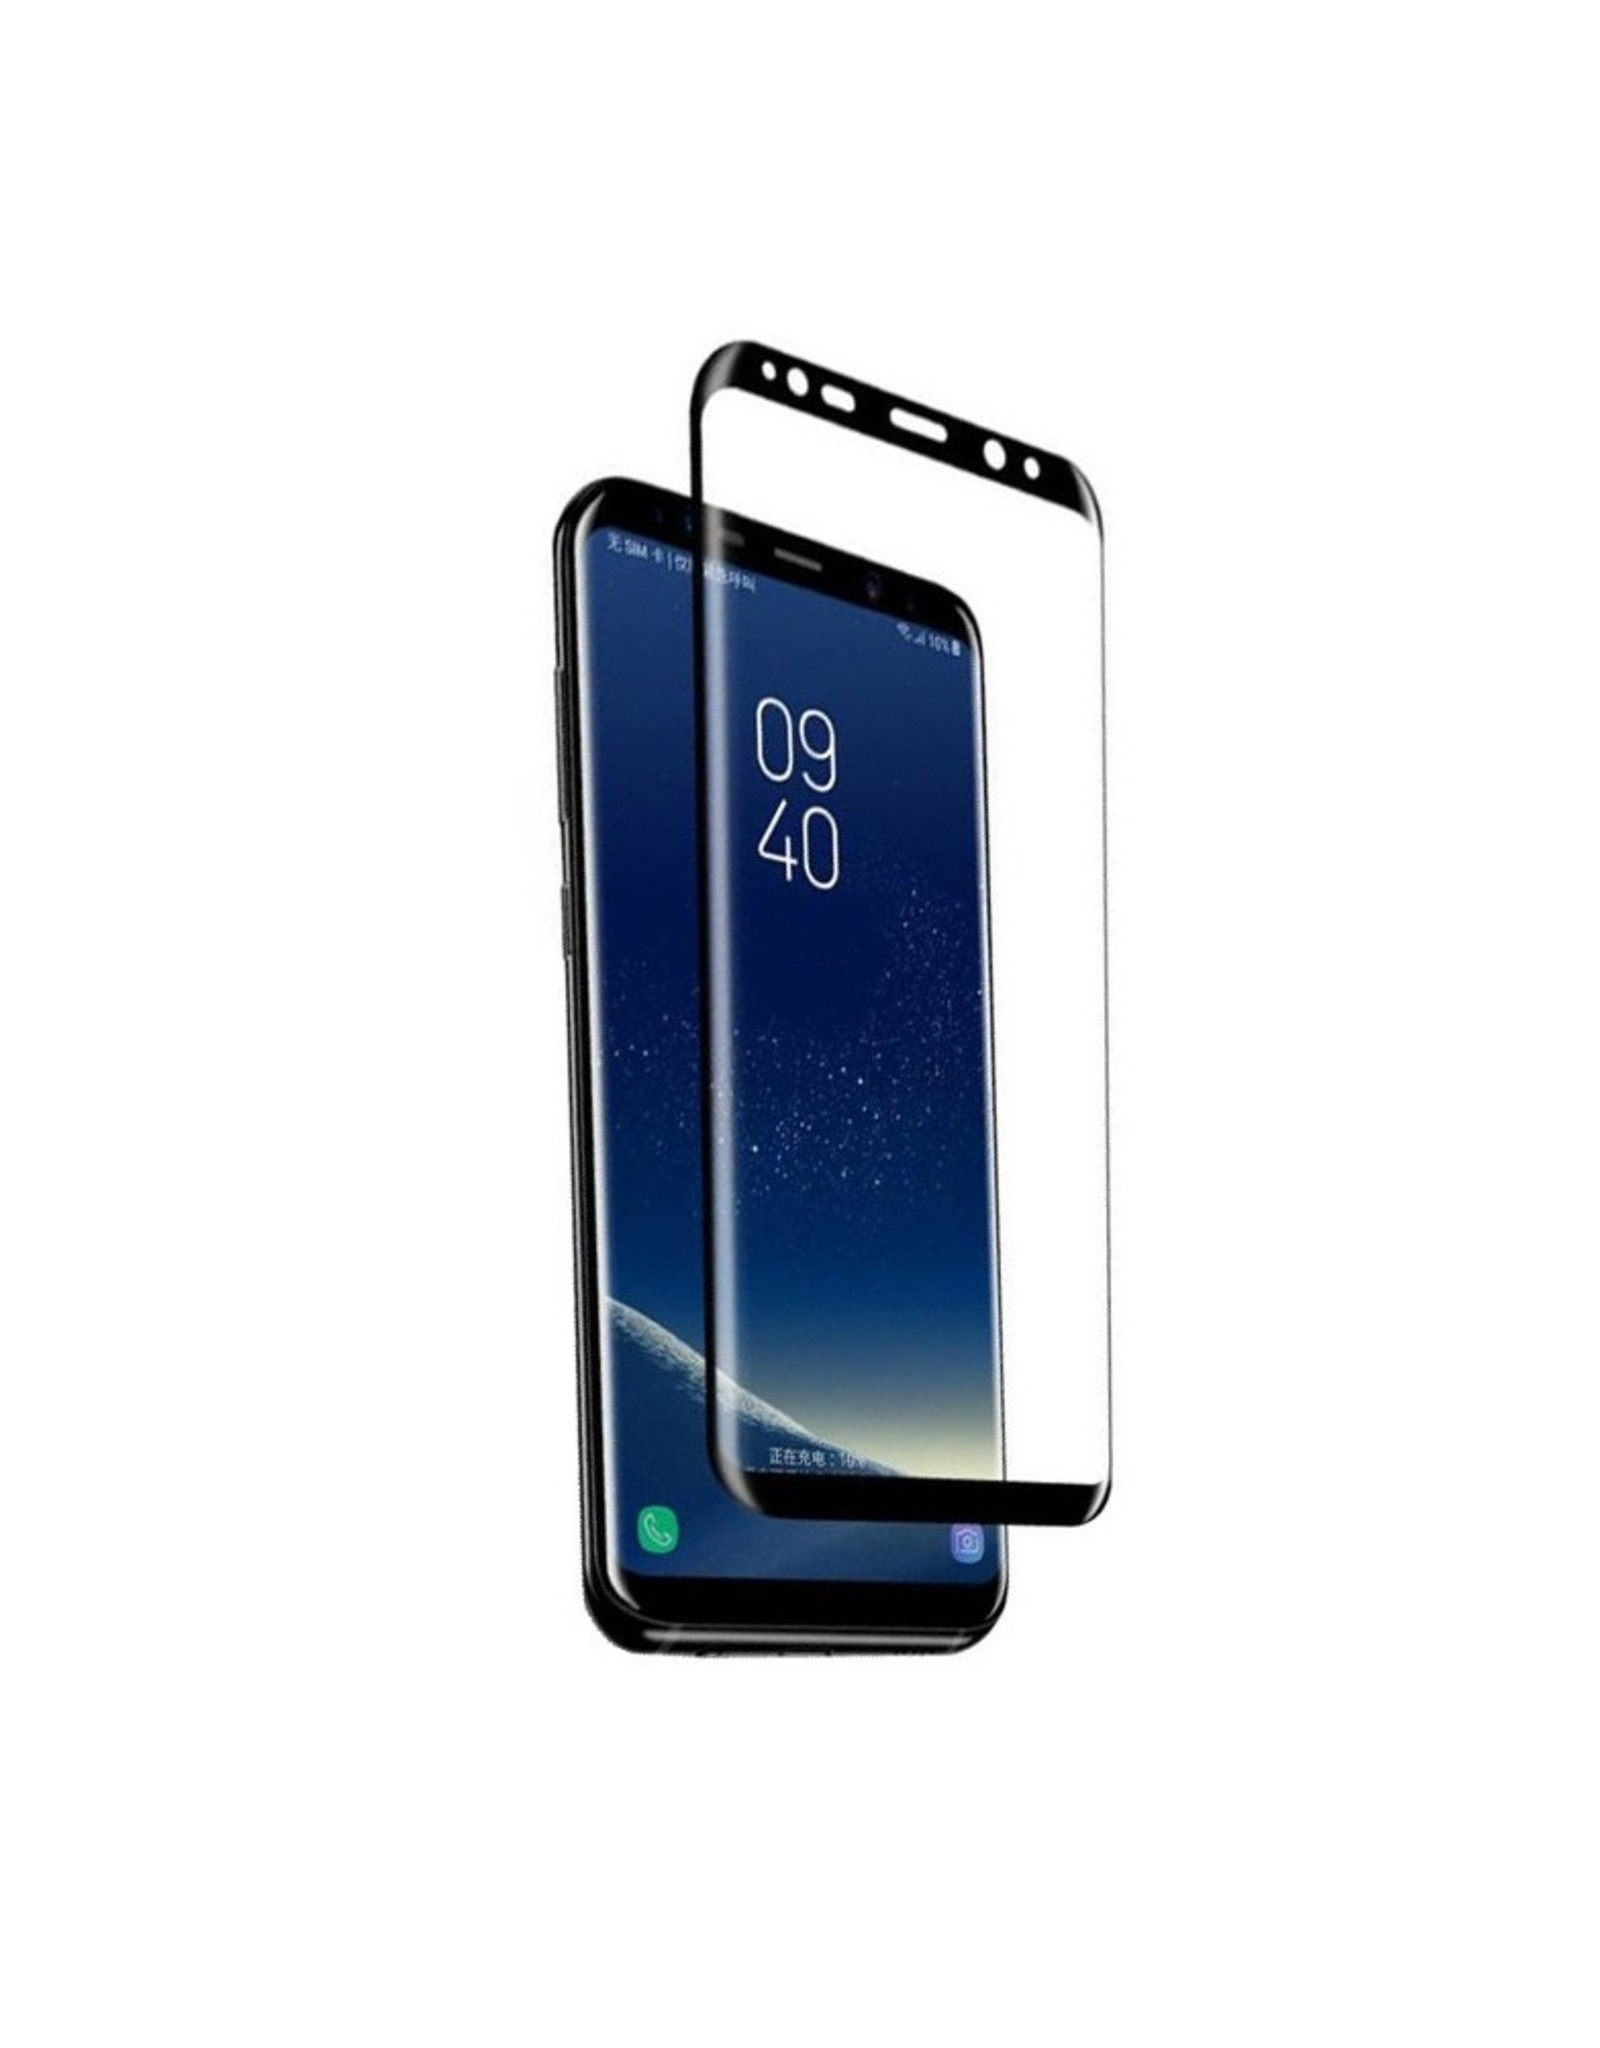 Blueo Blueo Samsung Galaxy S8 Tempered Glass Screen Protector Black